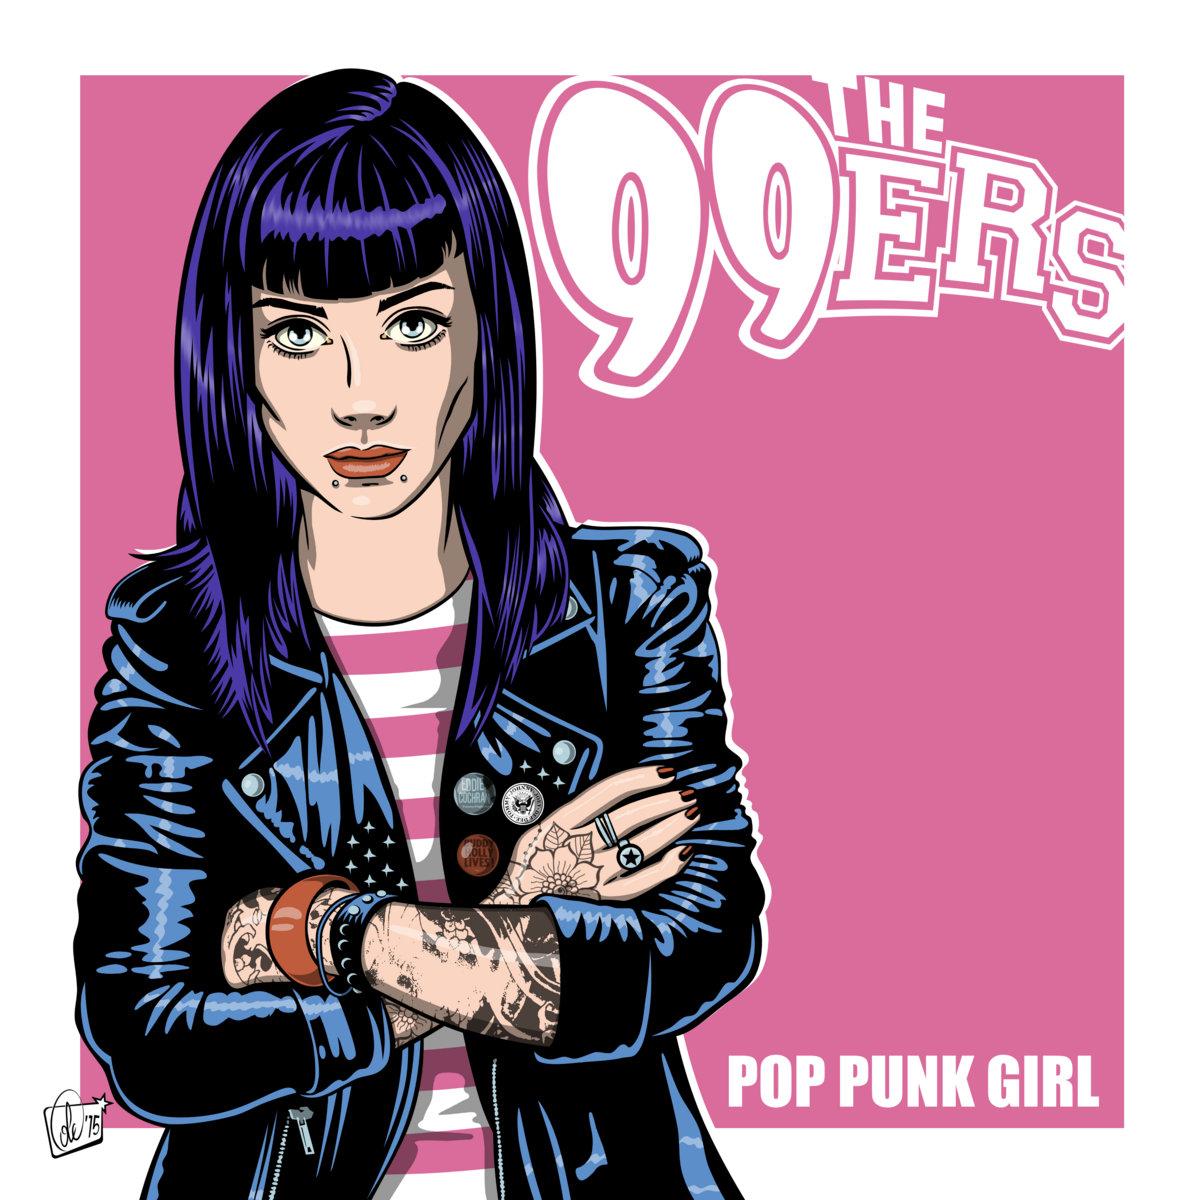 Punk rock girl mp3